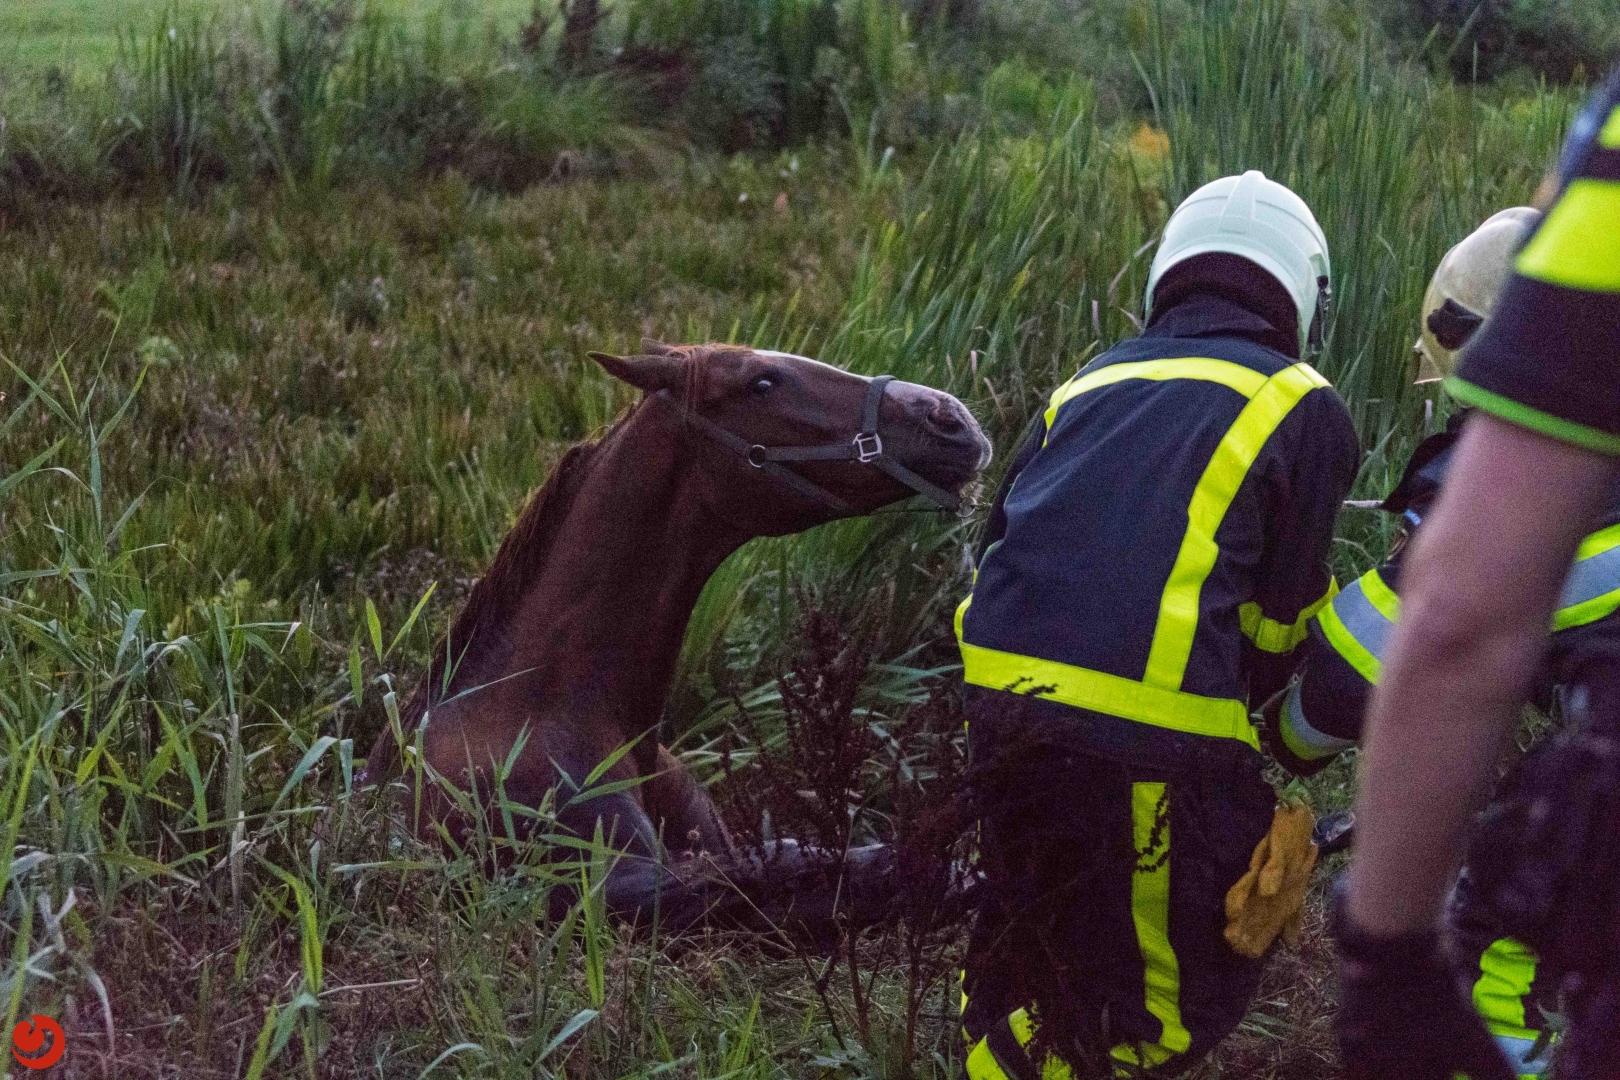 Brandweer helpt paard de sloot uit